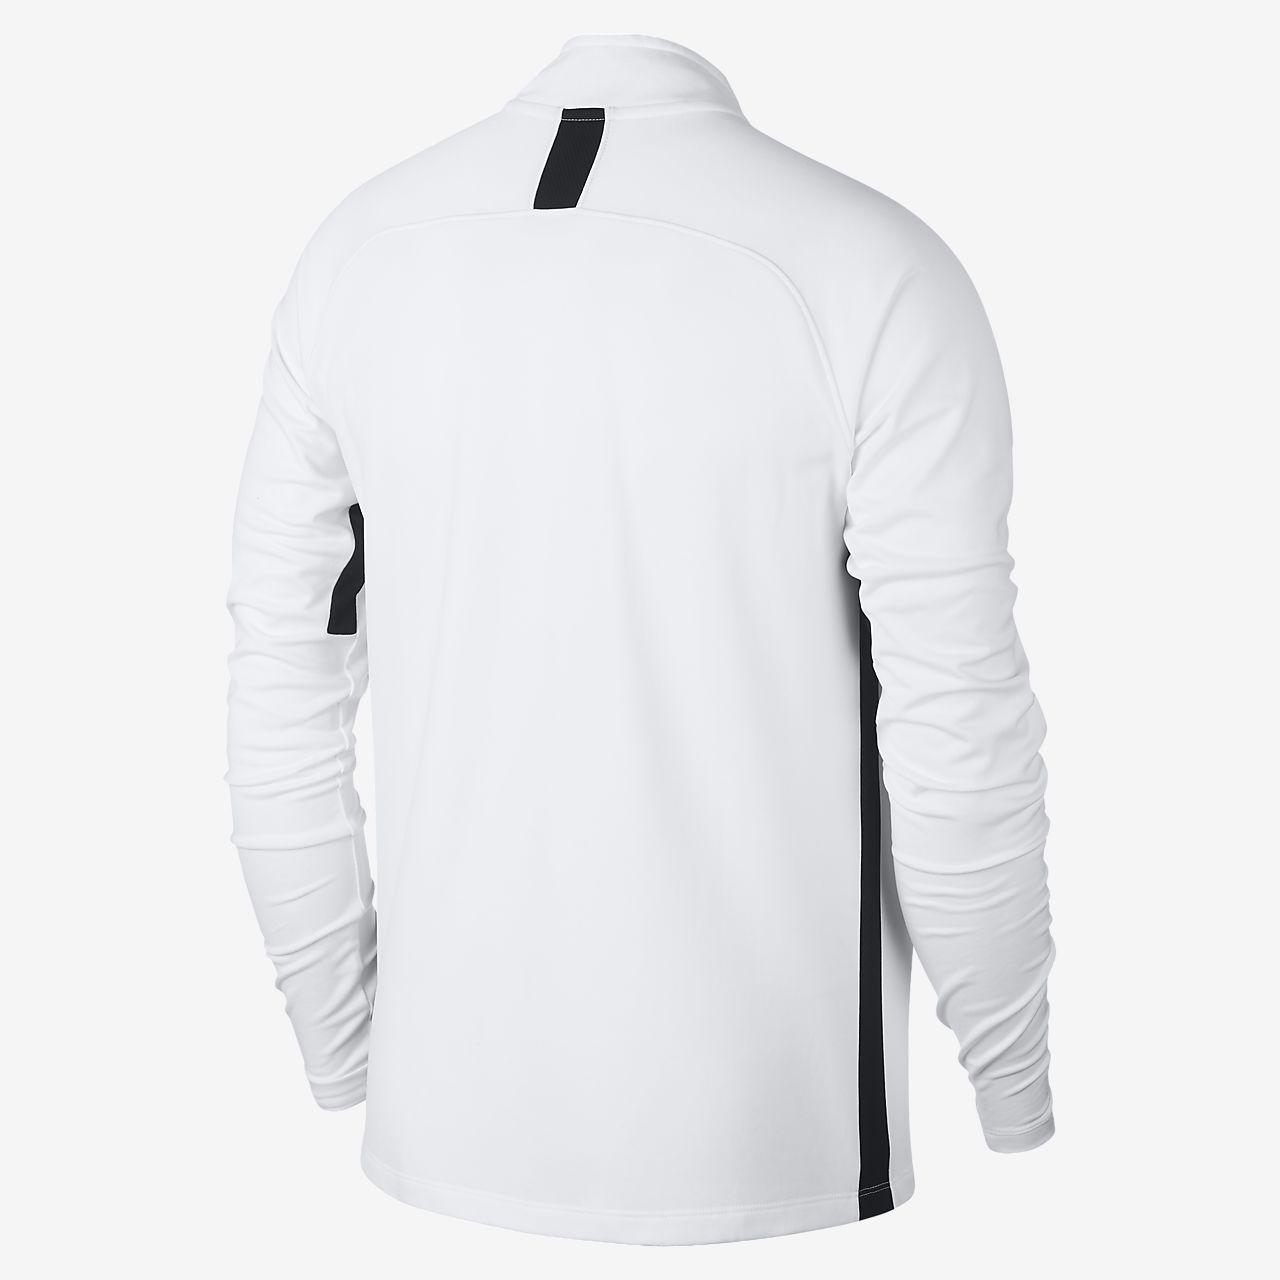 dd0212ac Nike Dri-FIT Academy Men's Soccer Drill Top. Nike.com